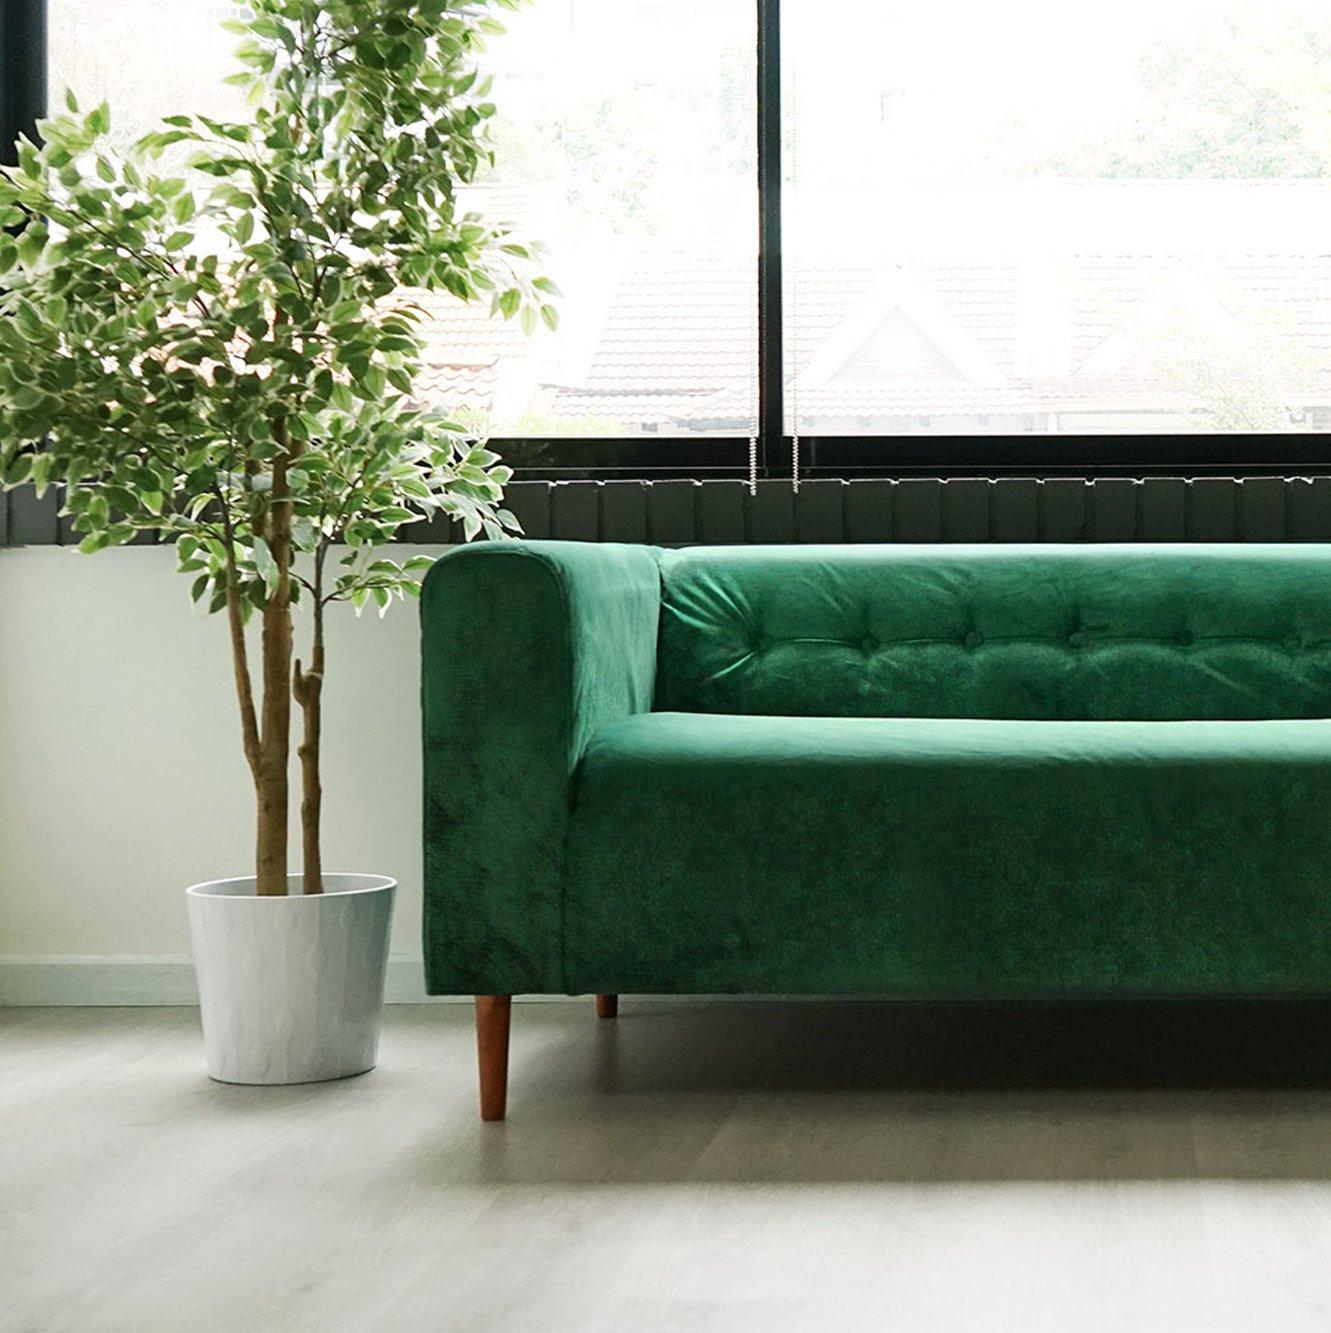 https://comfort-works.com/es/content/que-es-exactamente-el-estilo-minimalista-110